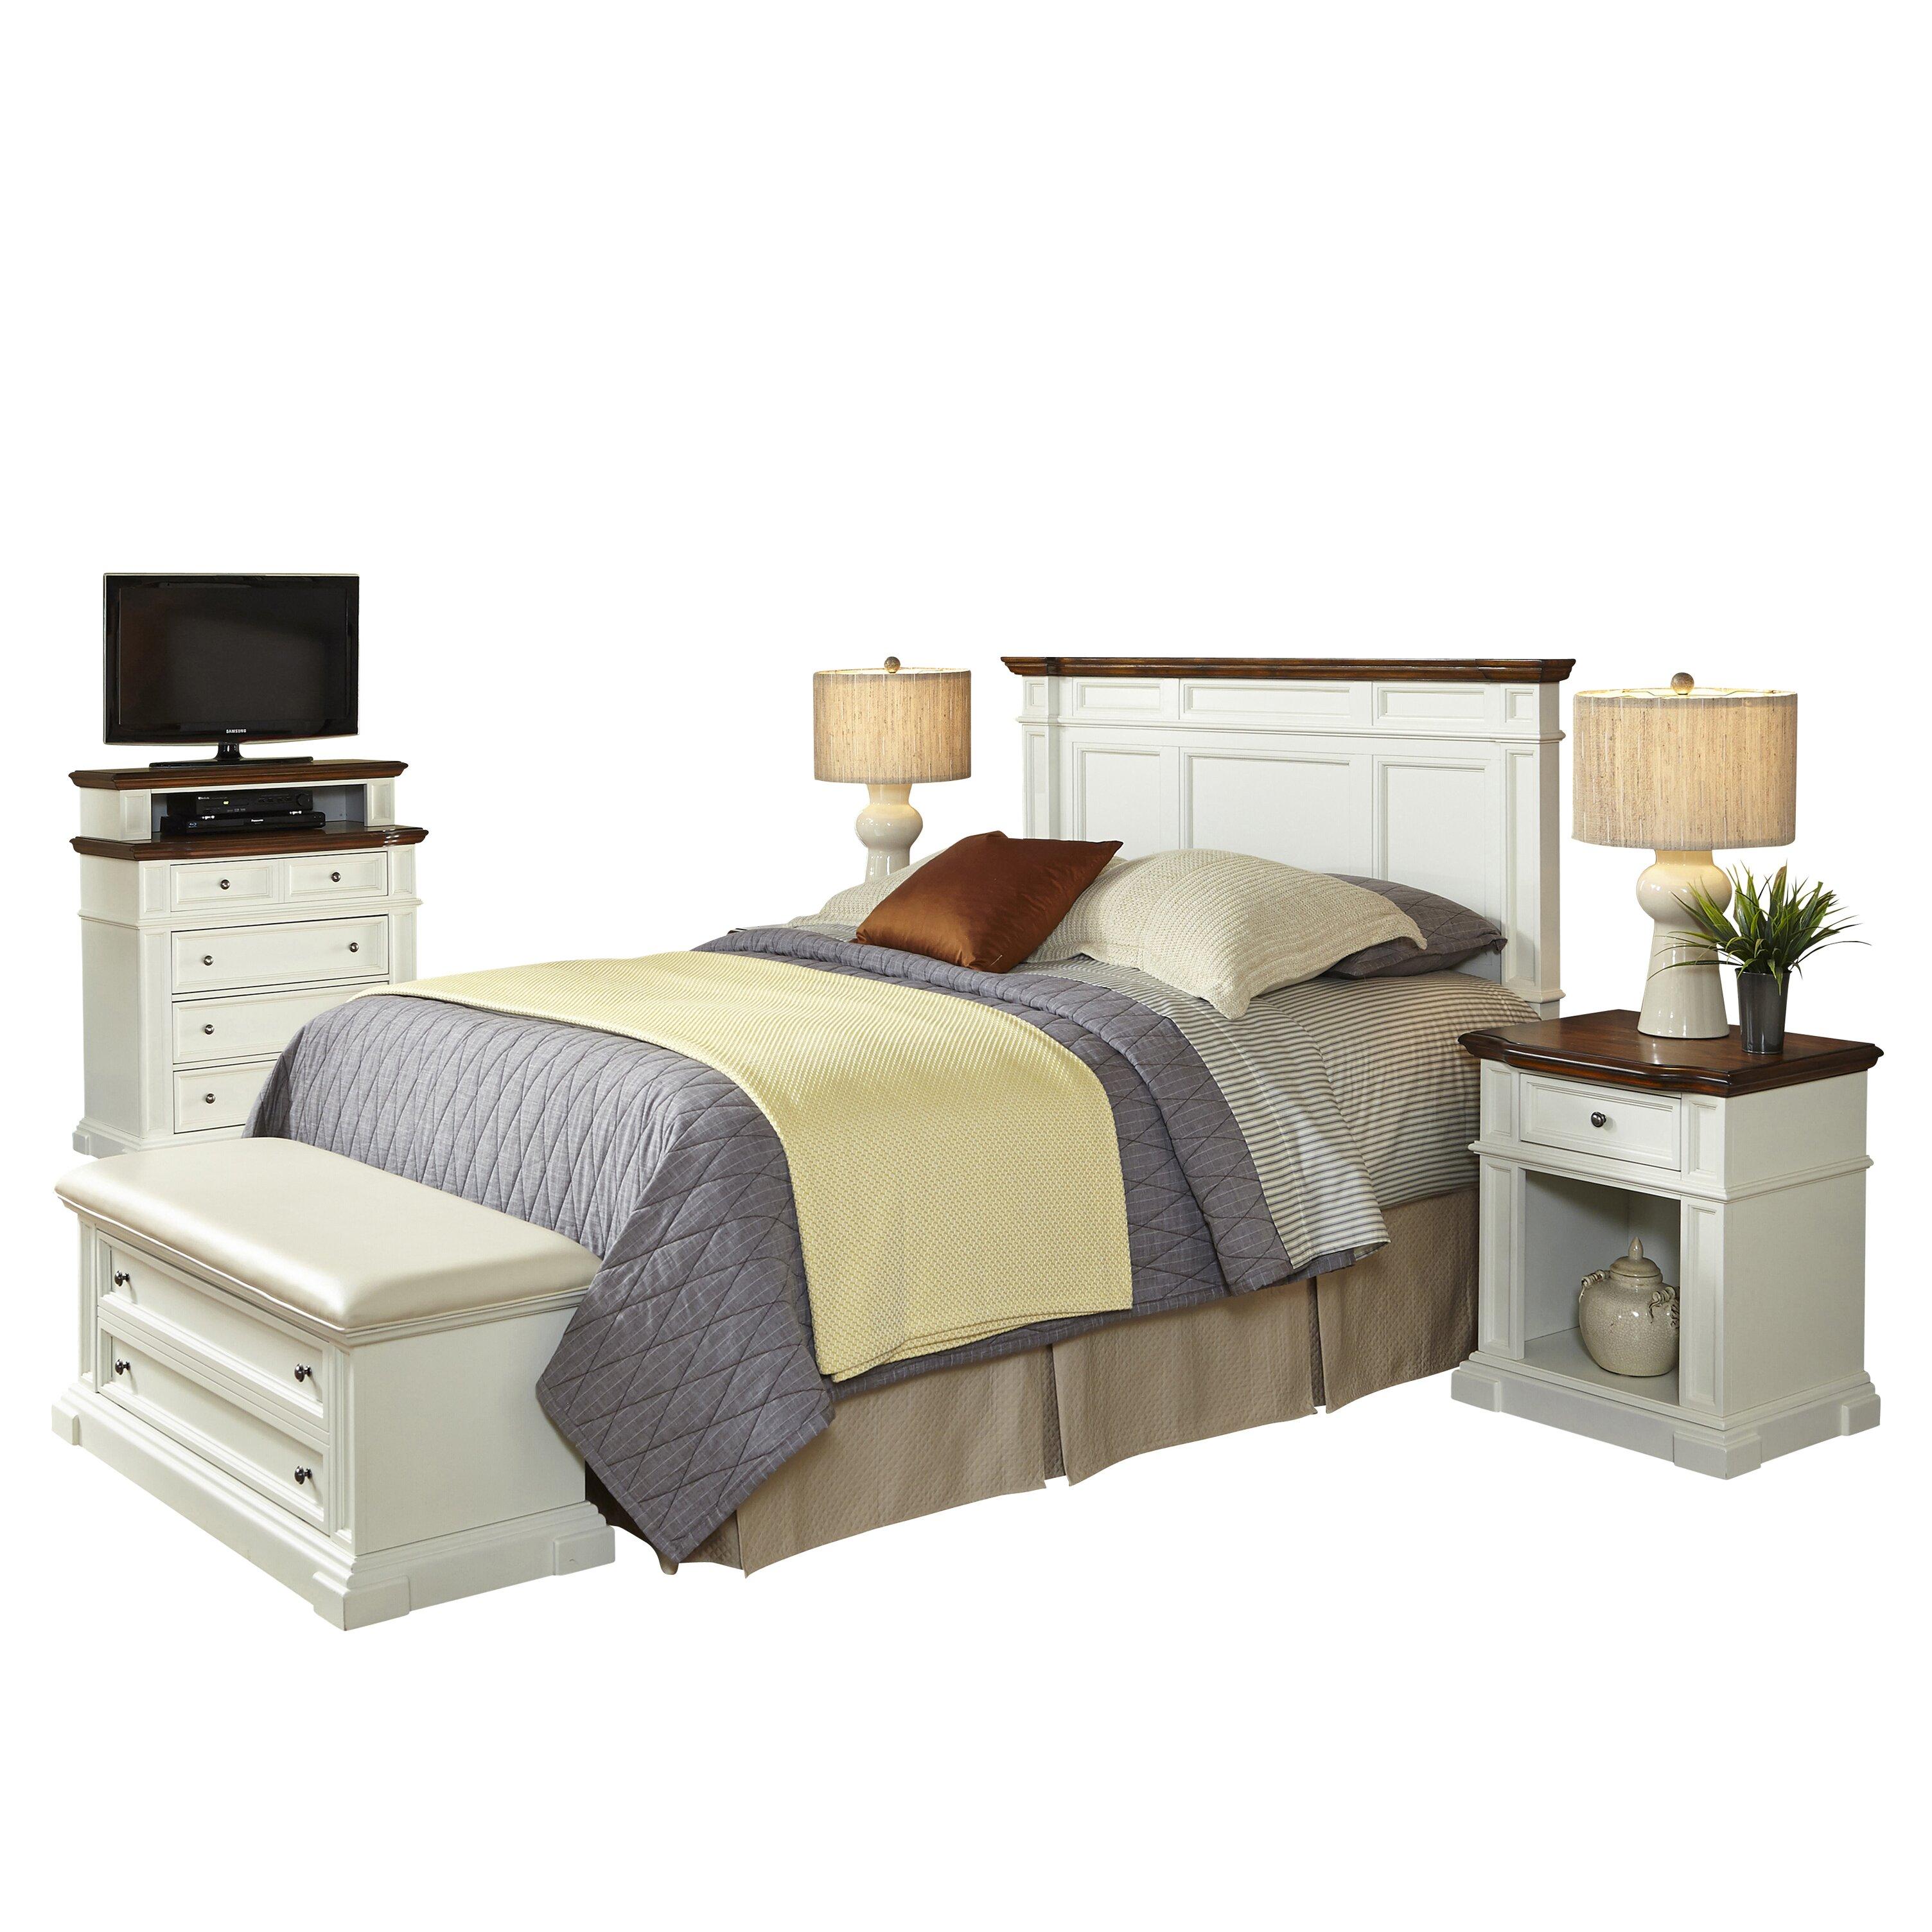 home styles americana platfrom 5 piece bedroom set reviews wayfair. Black Bedroom Furniture Sets. Home Design Ideas